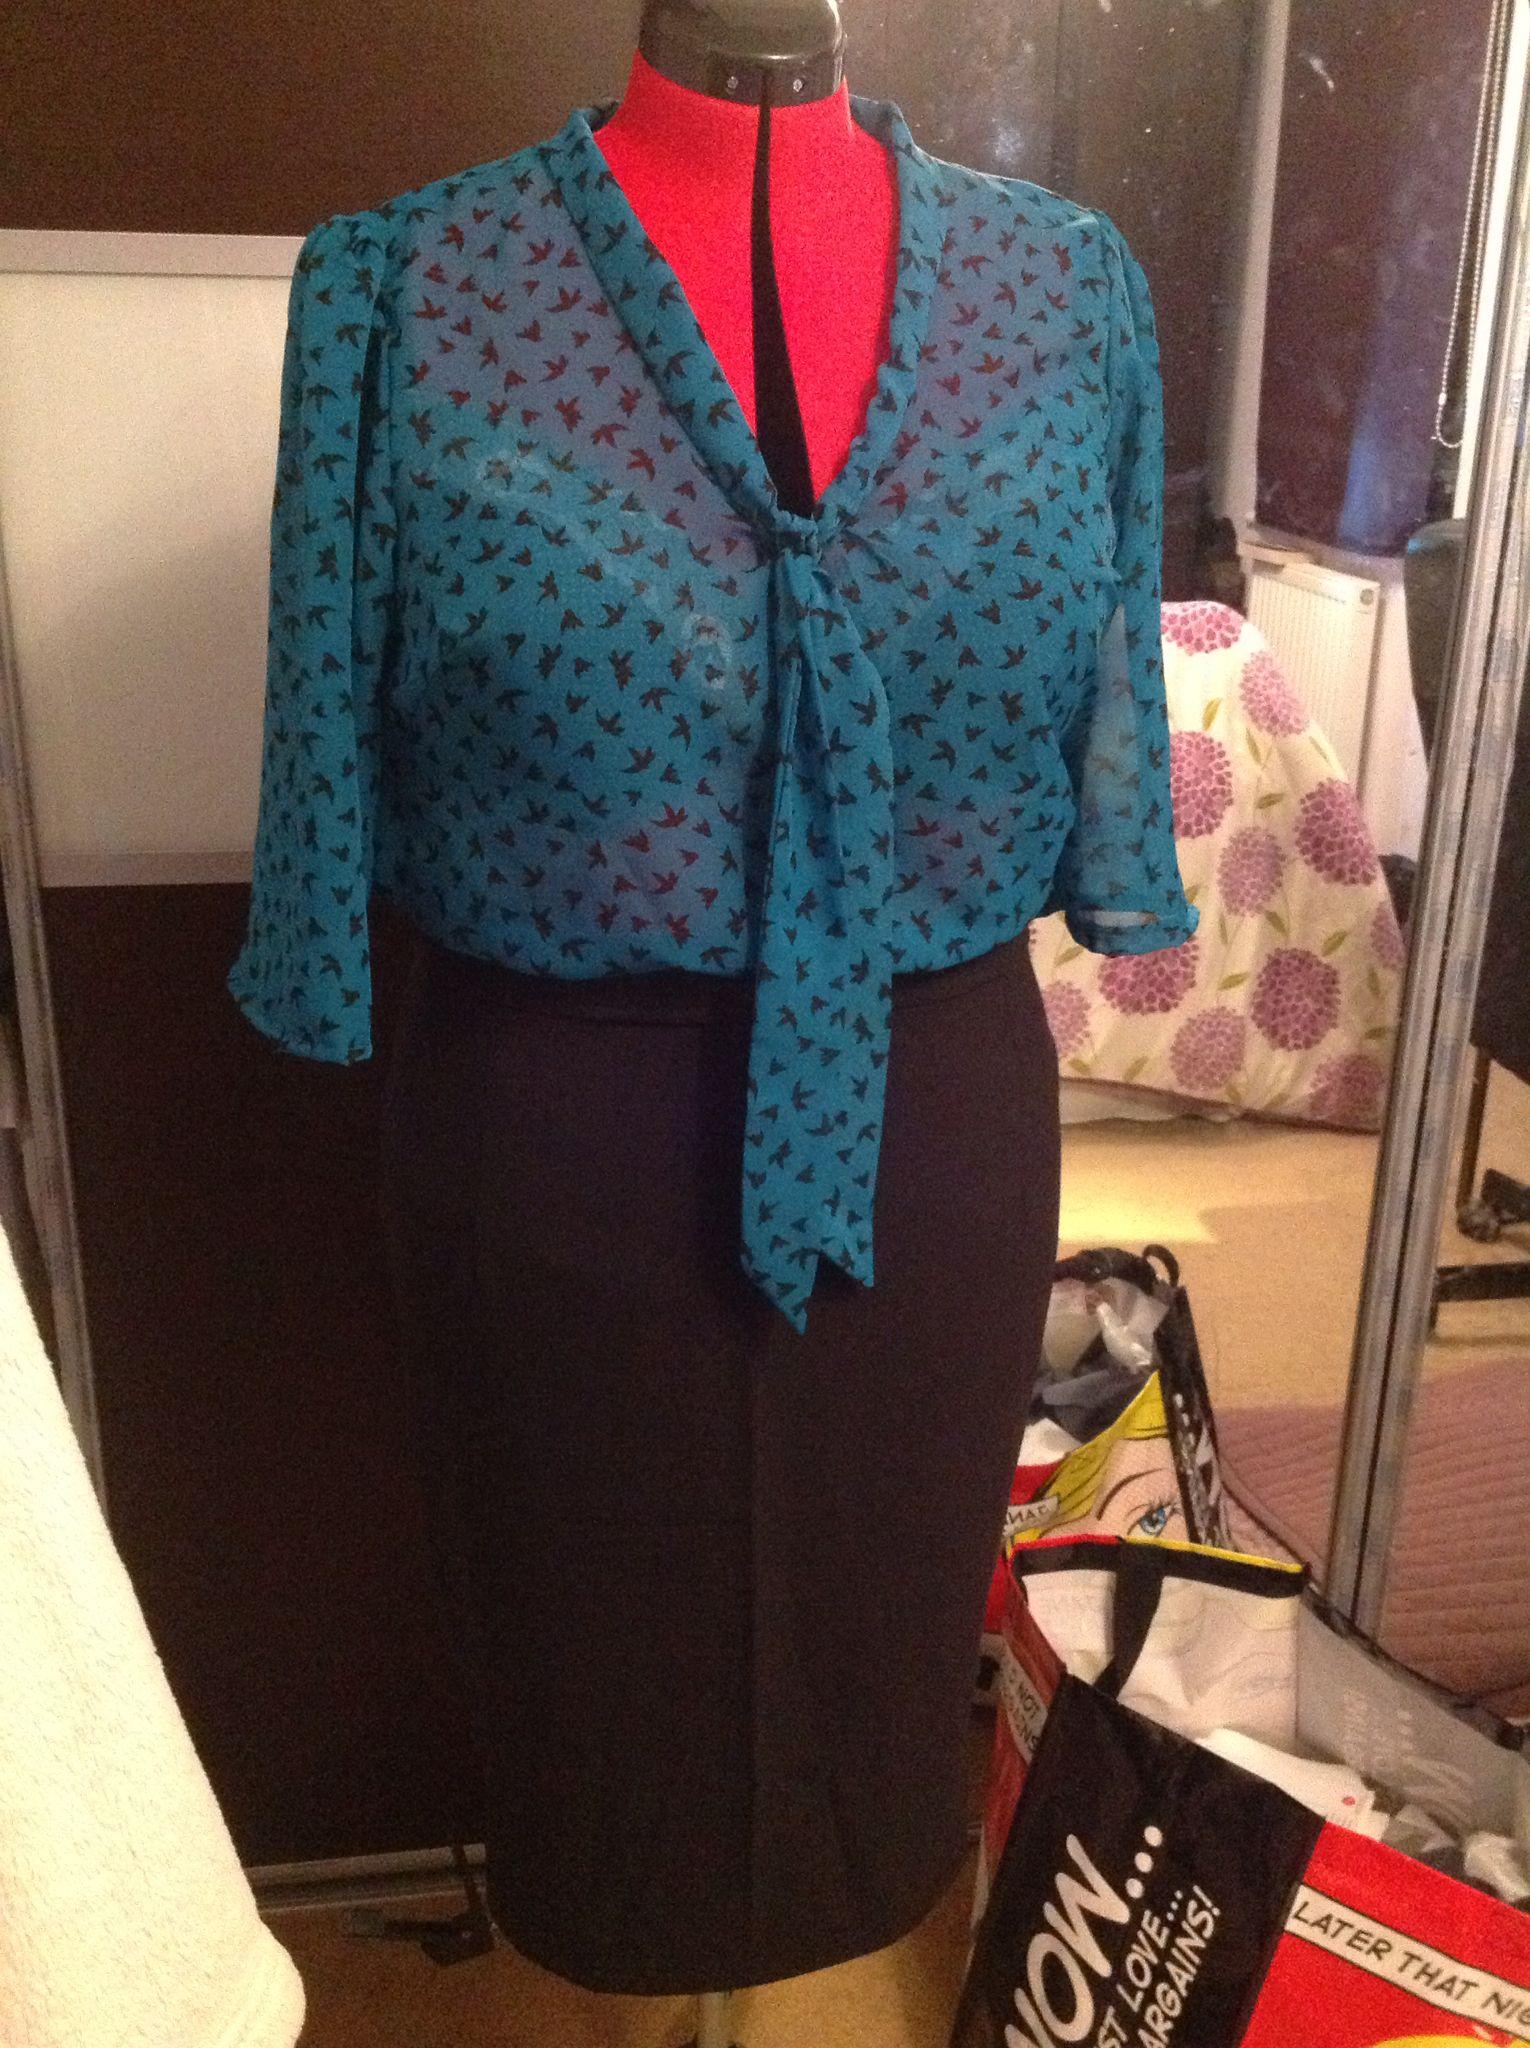 Lottie blouse and skirt